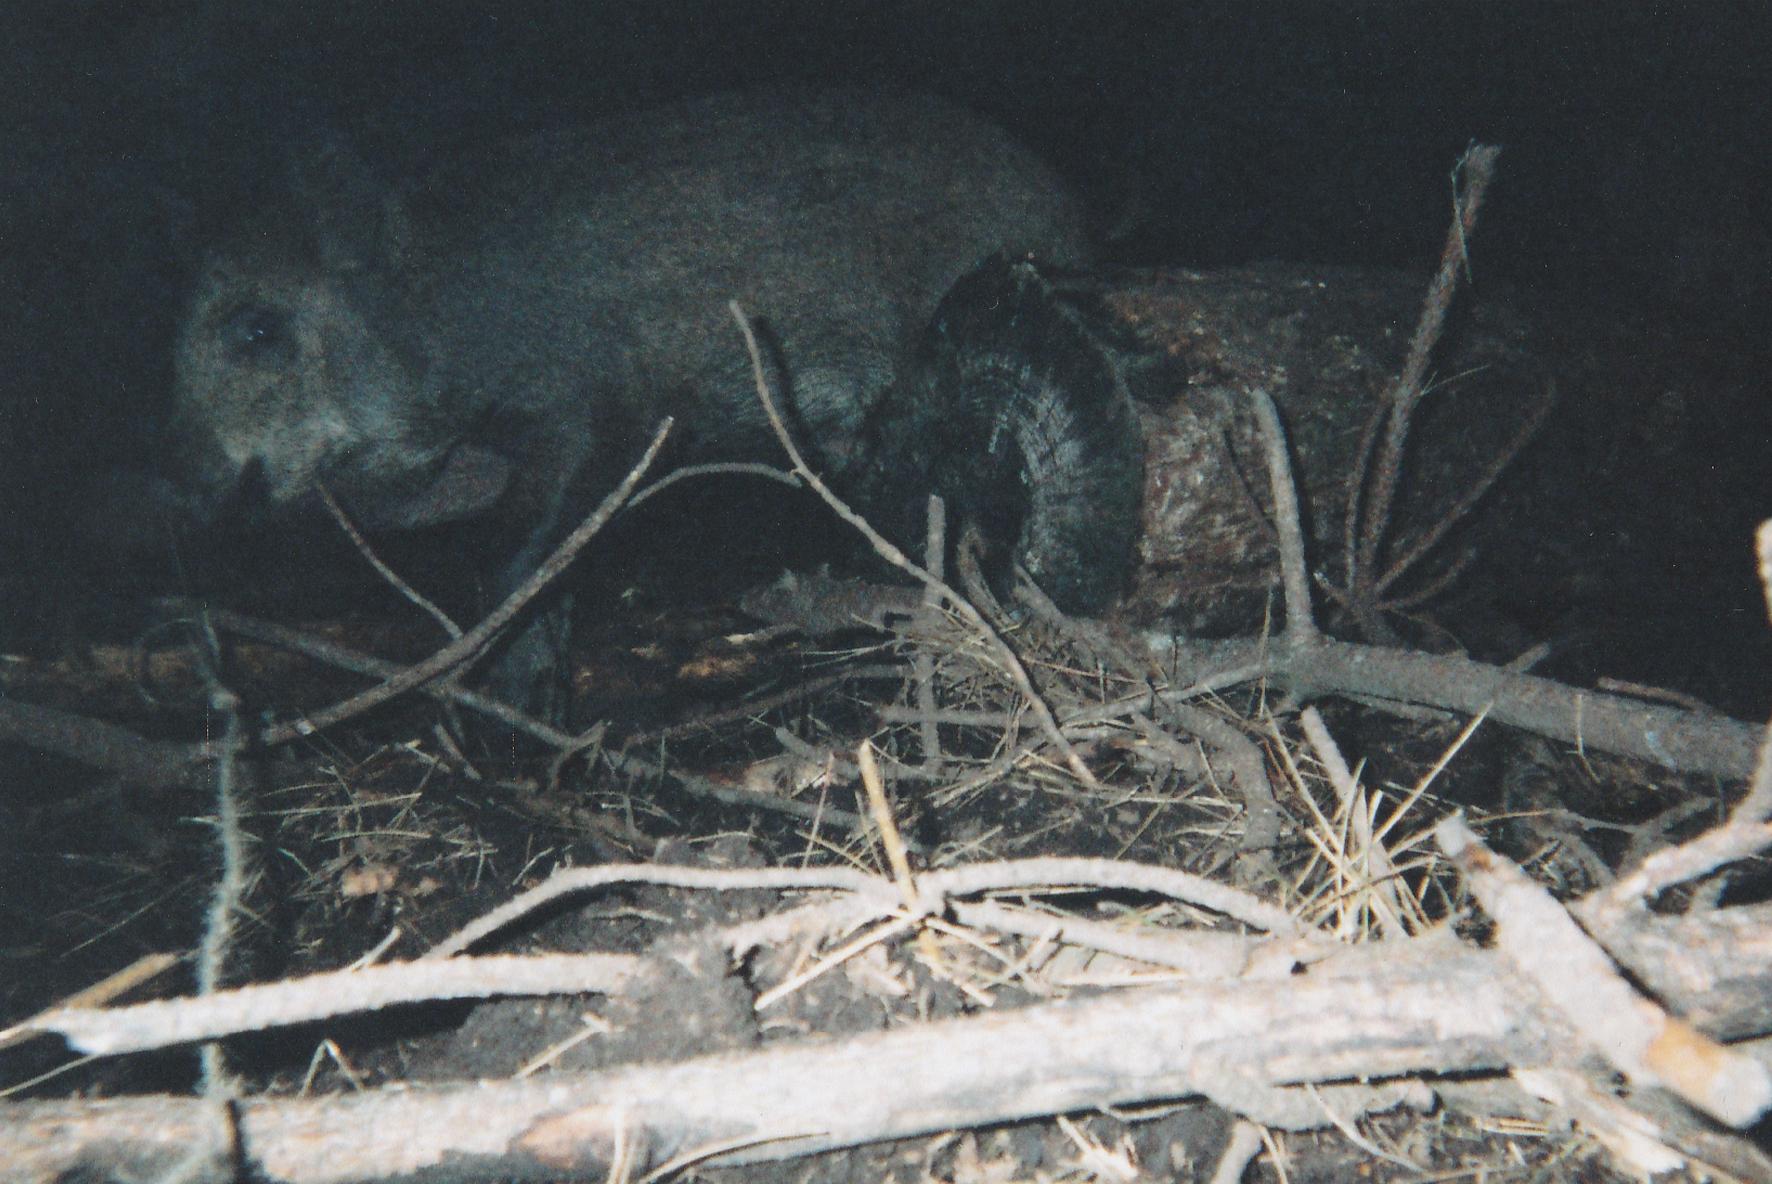 Wild Boar Photos 12.jpg